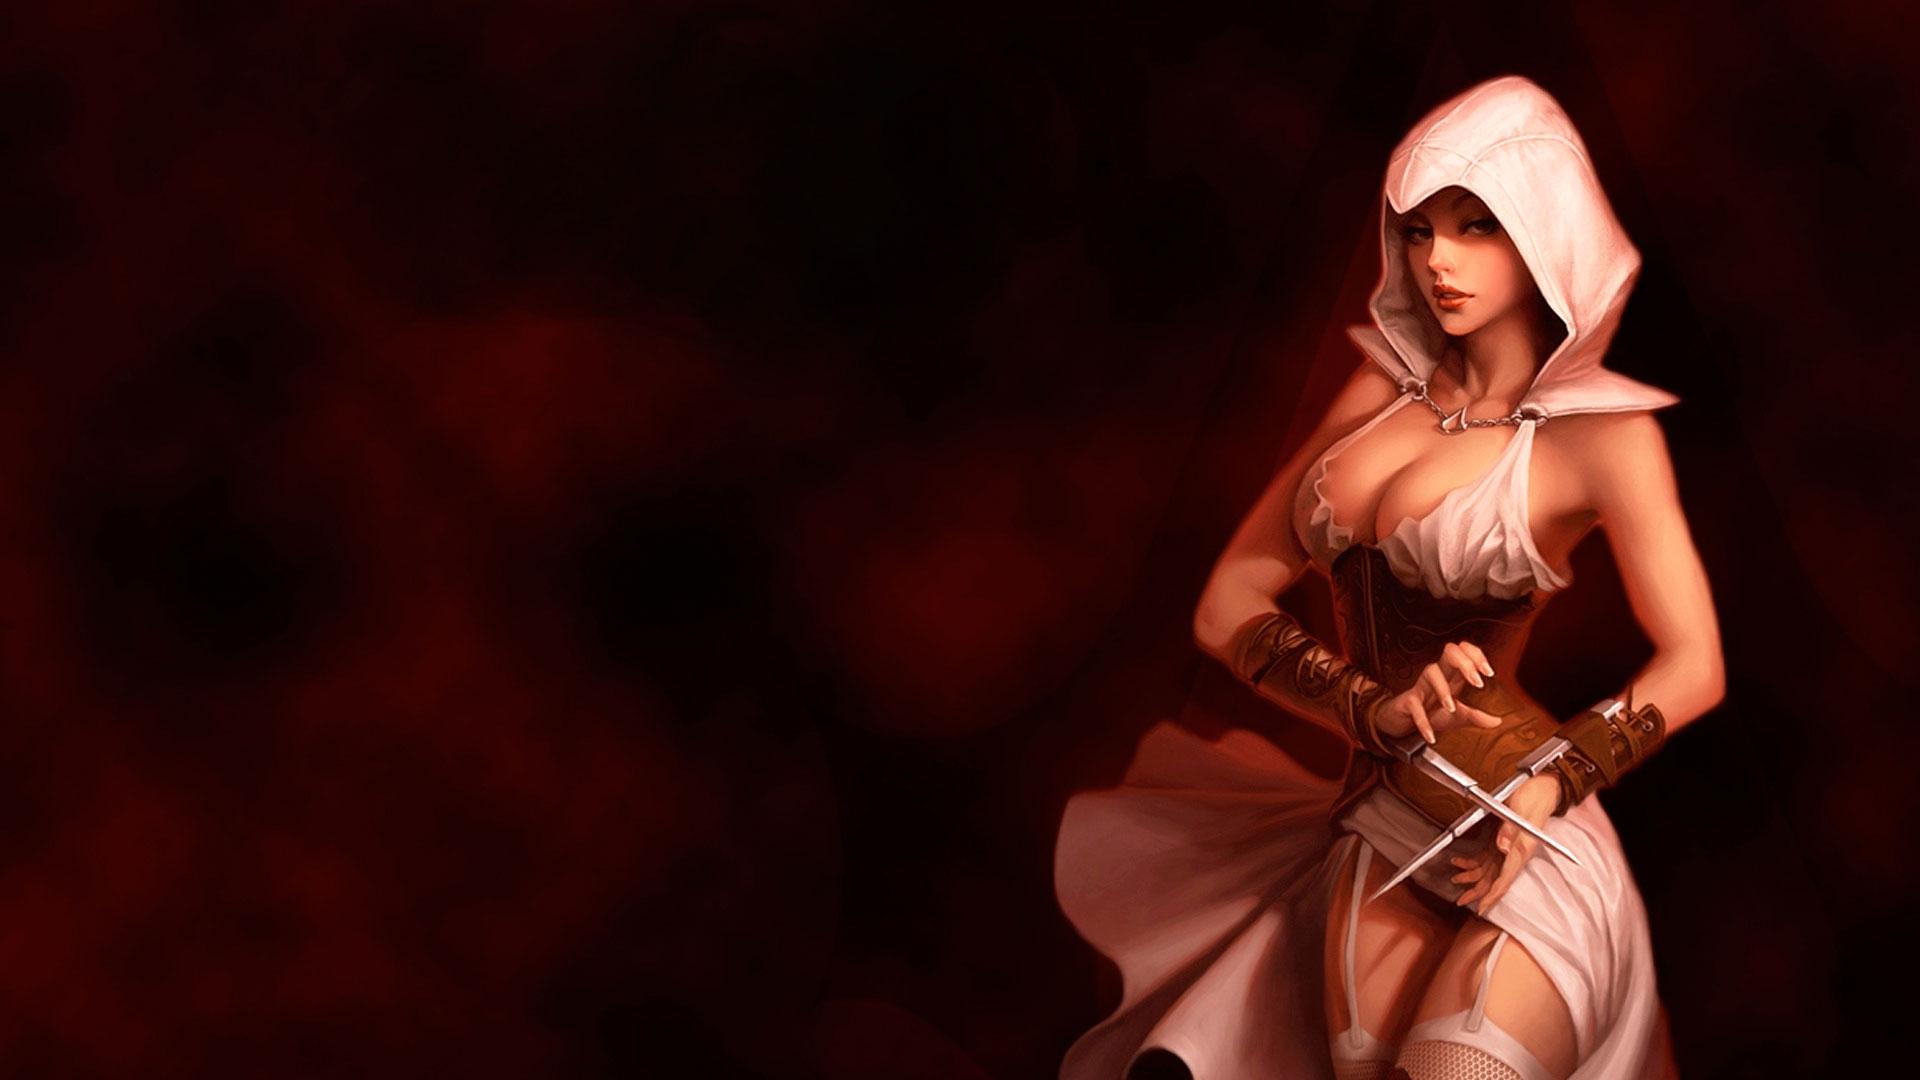 Assassin's creed brotherhood xxx gif nackt super actresses